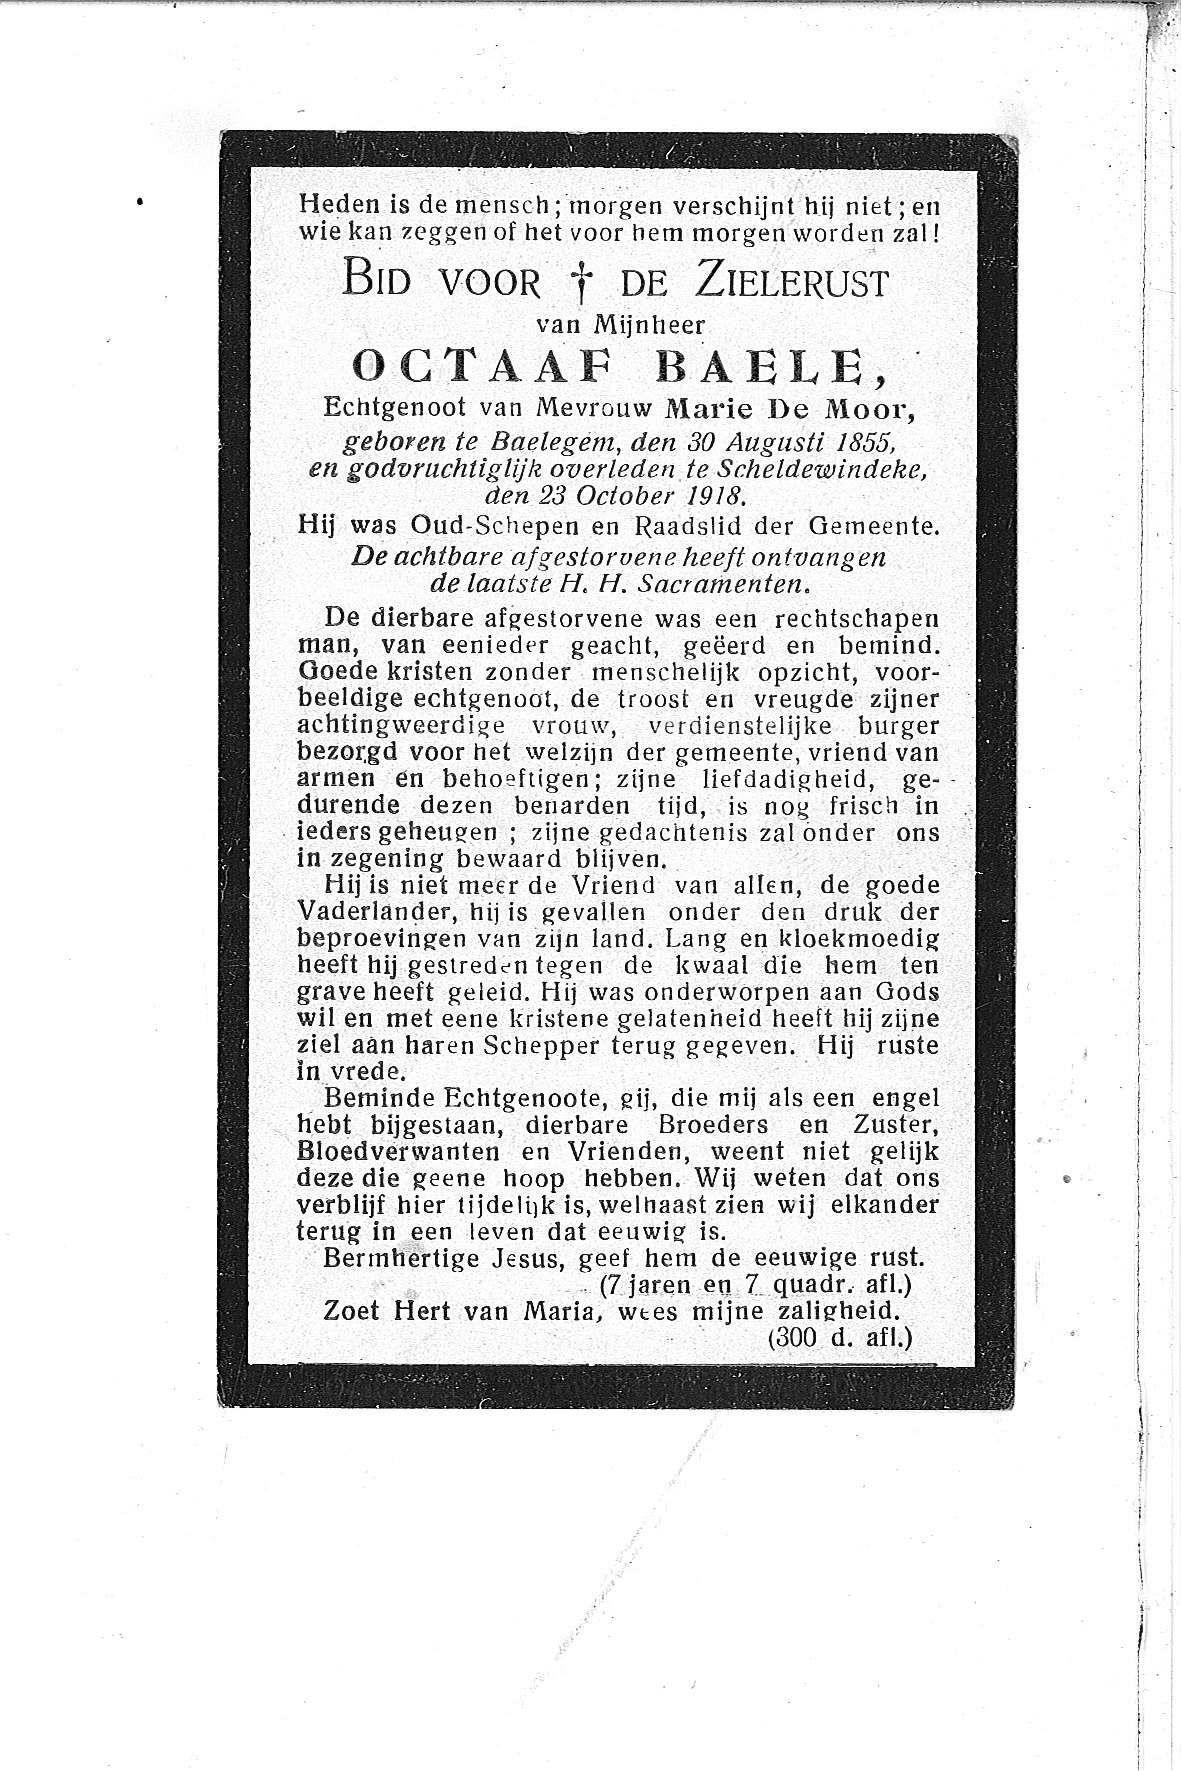 Octaaf(1918)20100928134653_00022.jpg